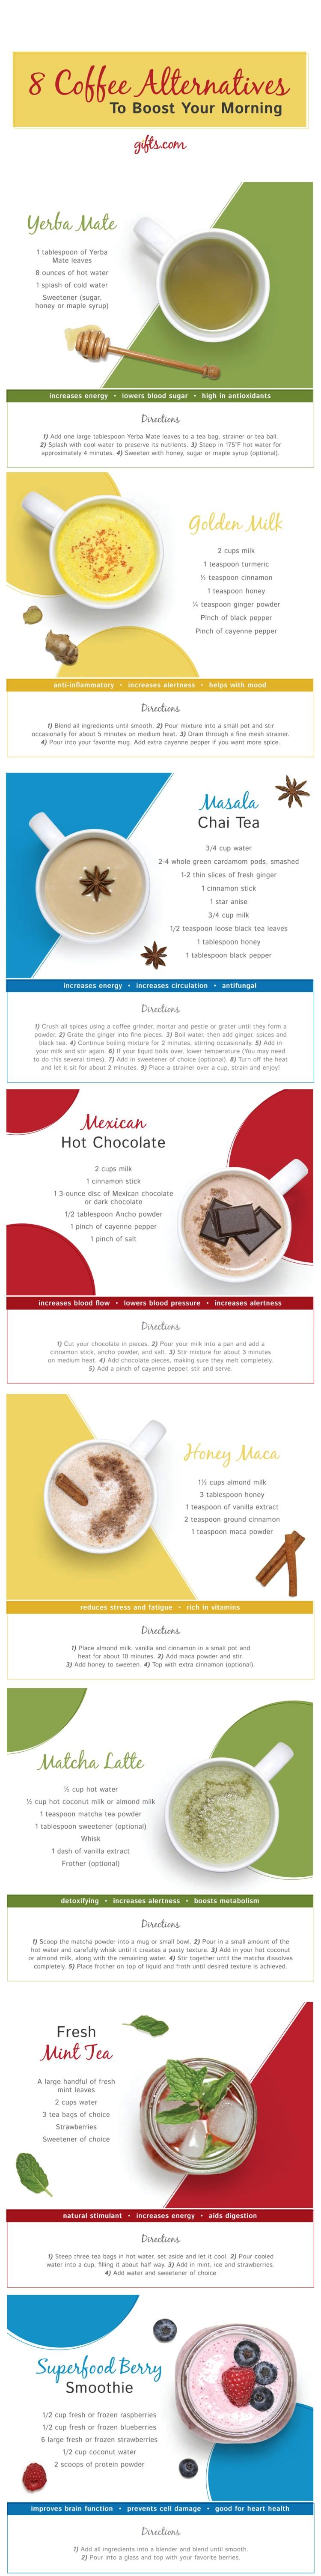 8 Coffee Alternatives